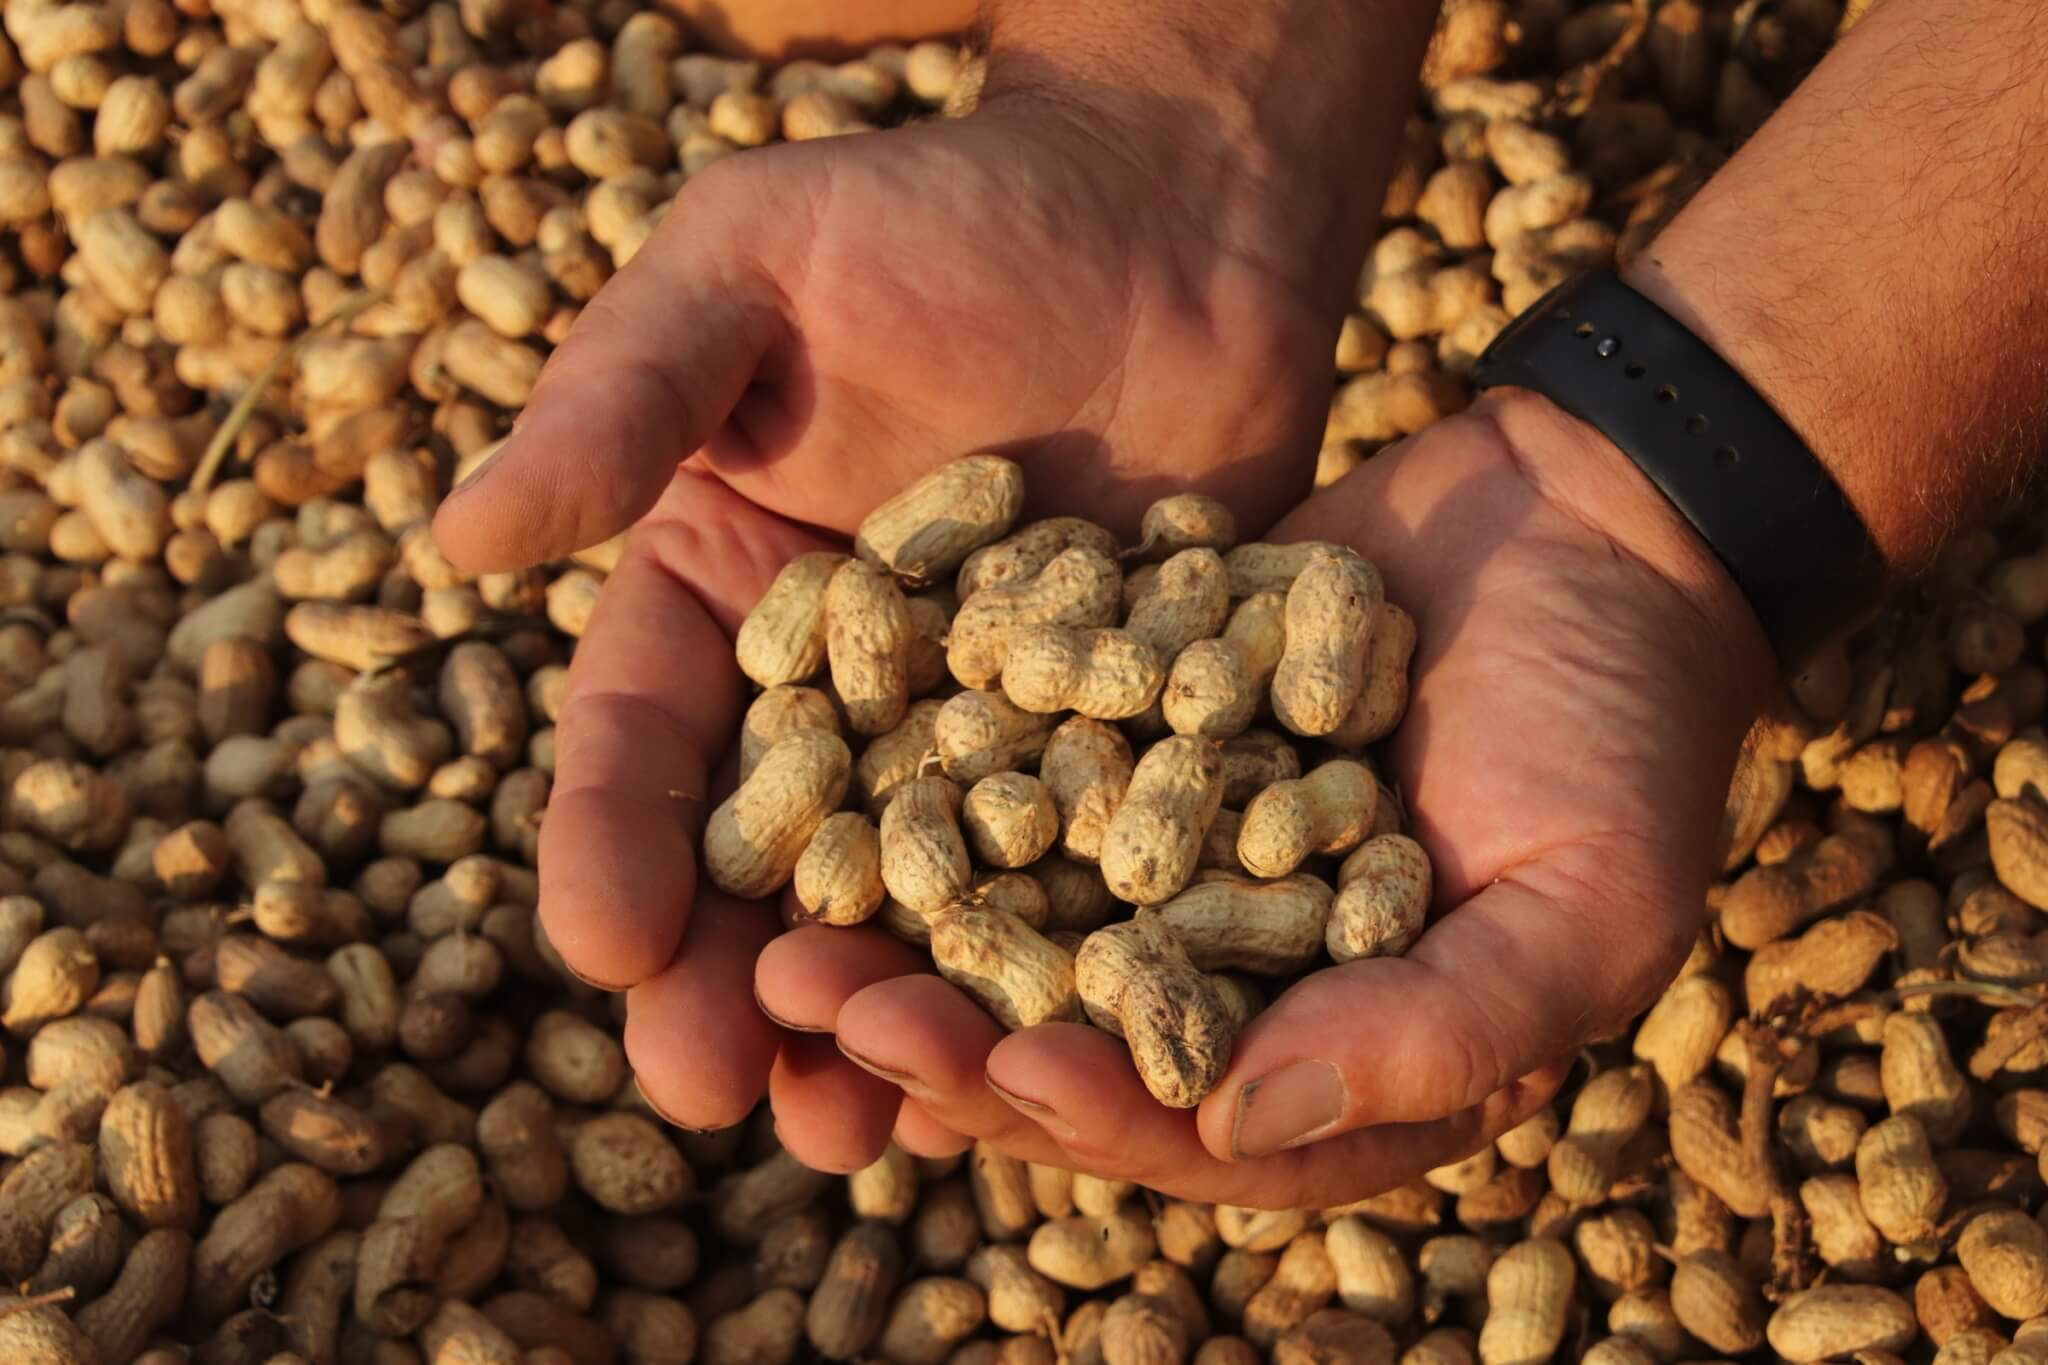 holding peanuts